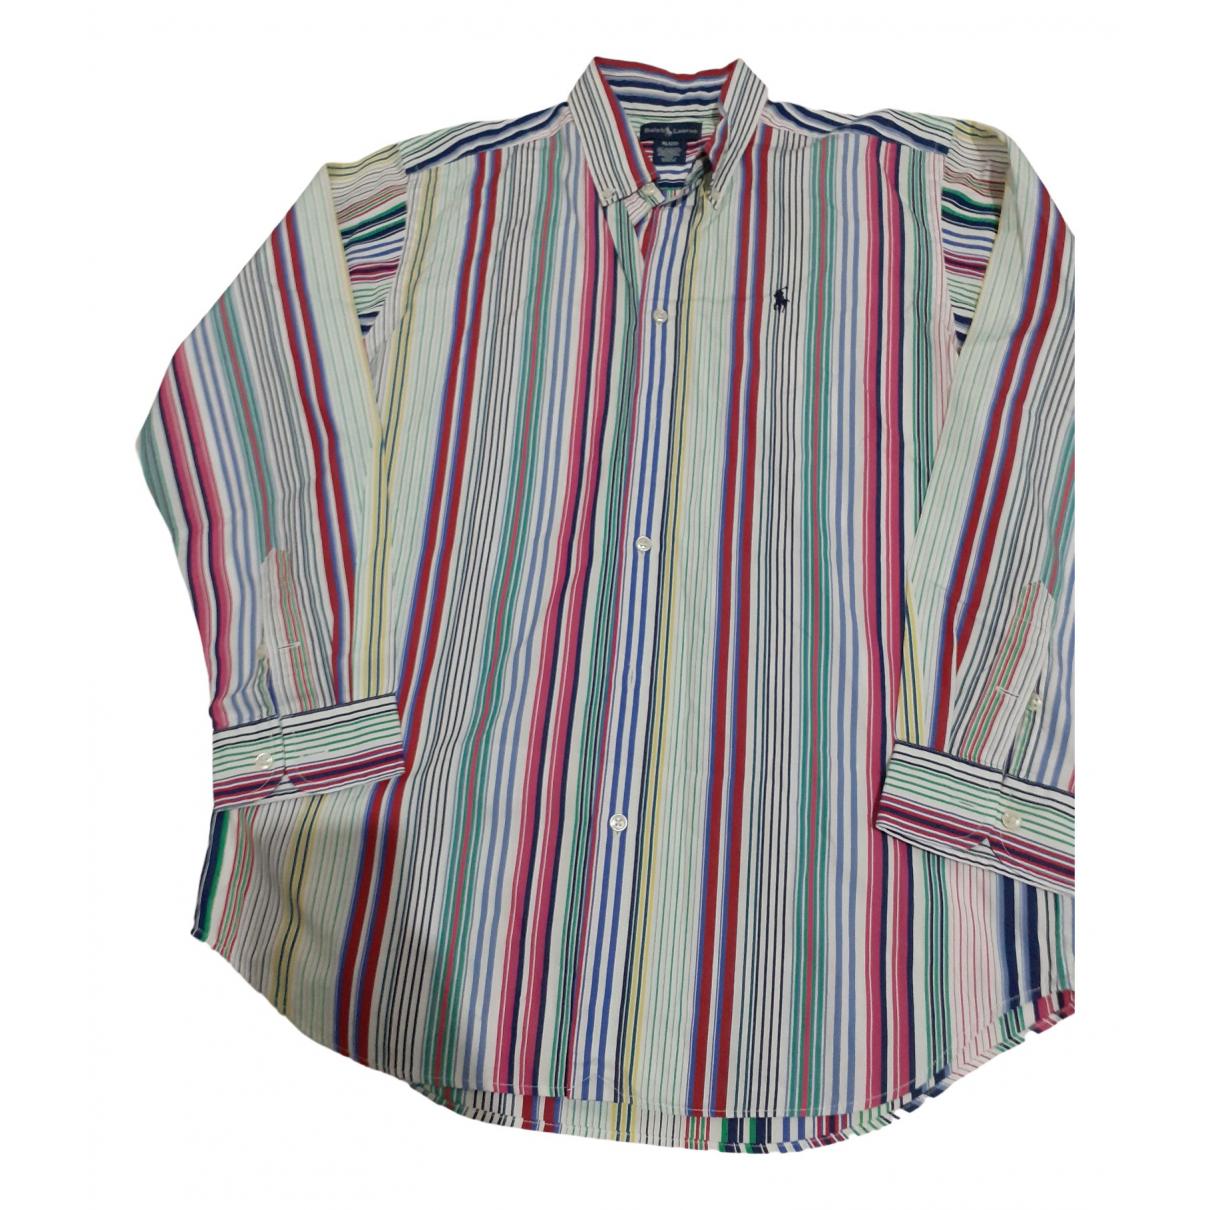 Ralph Lauren N Multicolour Cotton Shirts for Men XL International